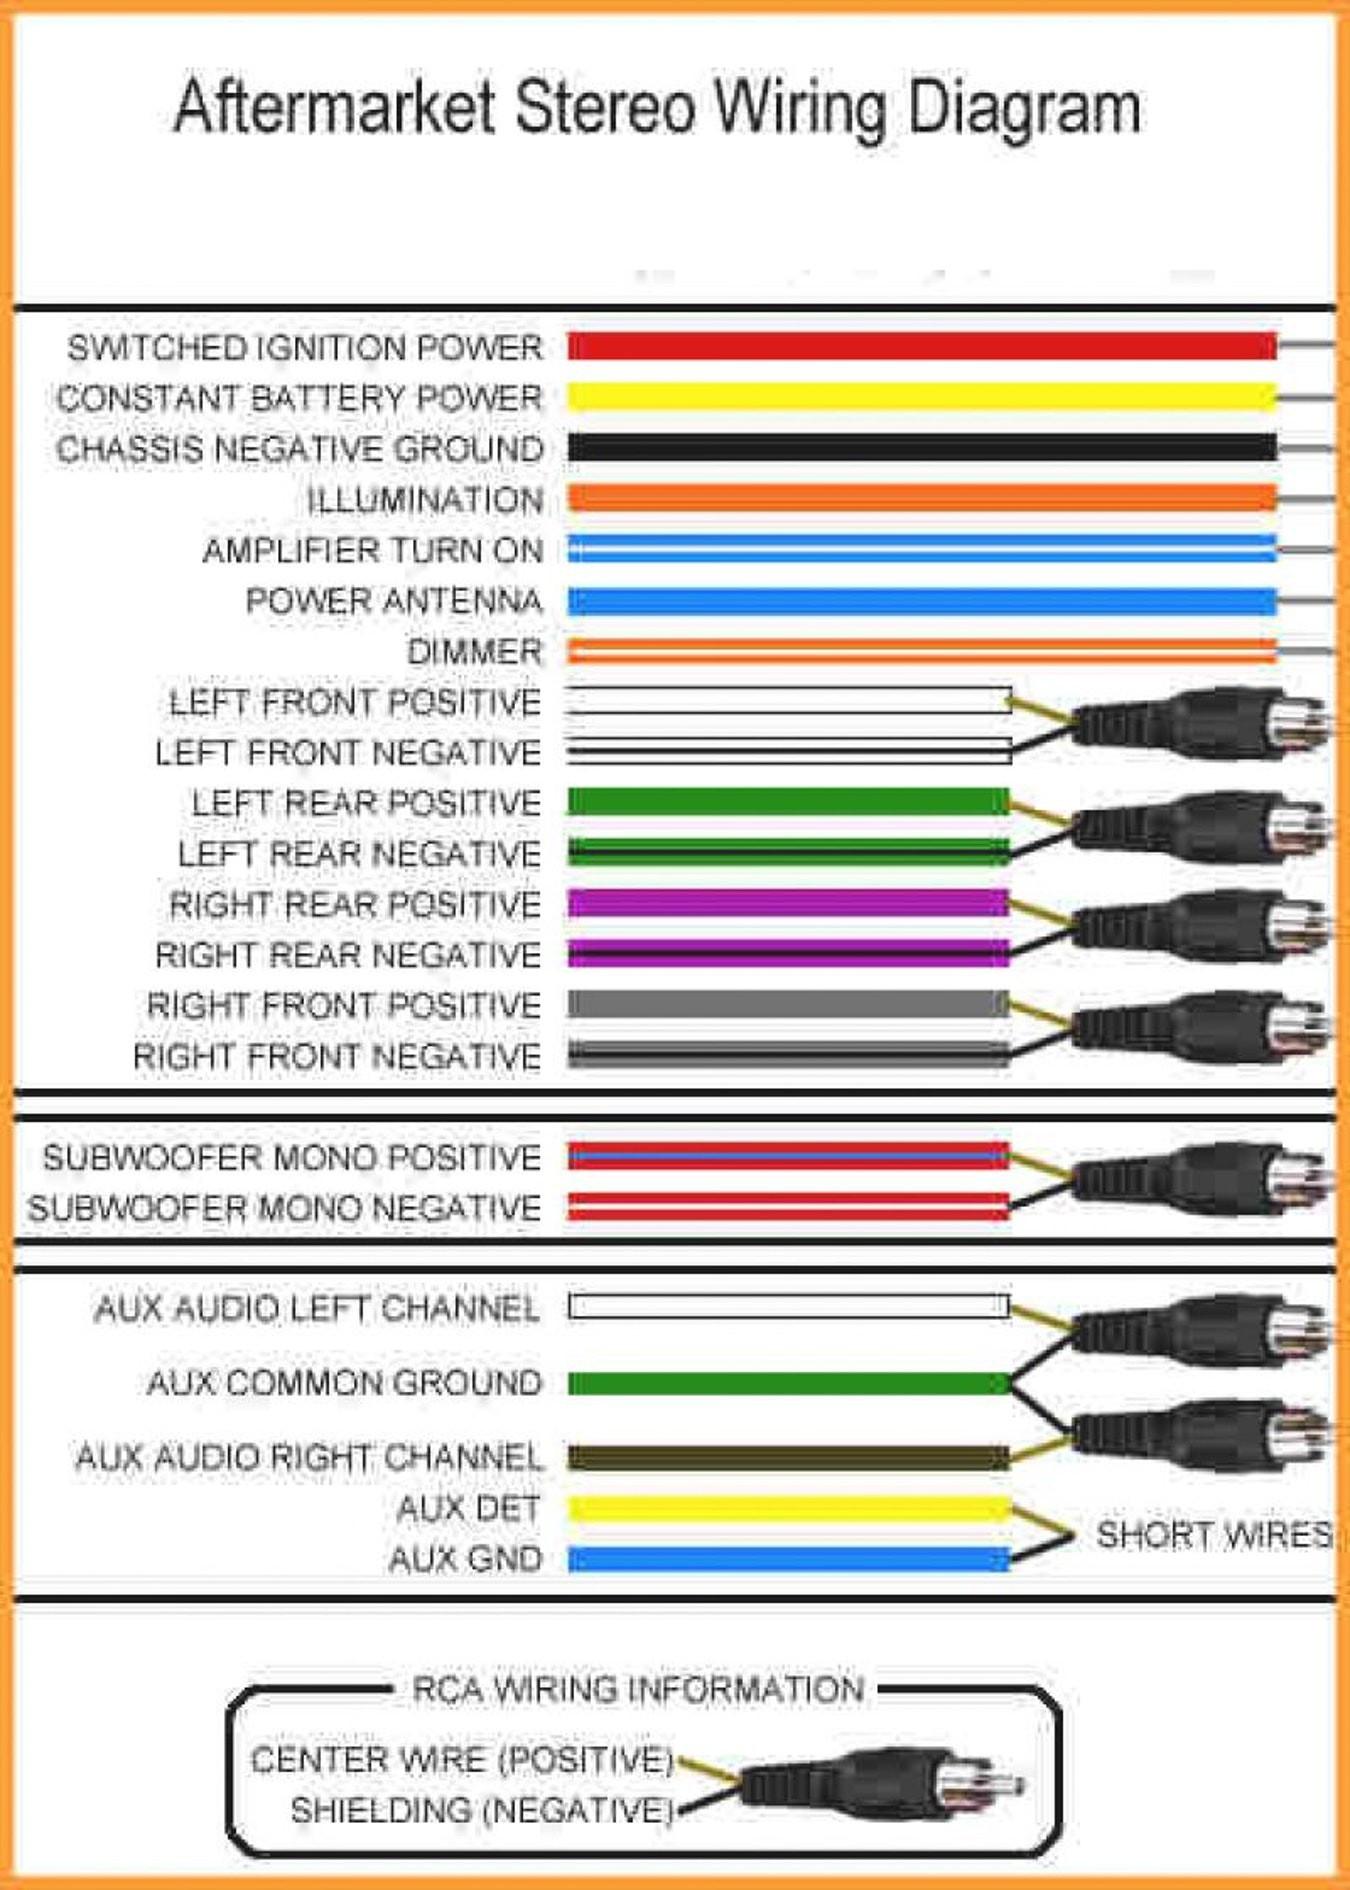 Car Stereo Speaker Wiring Diagram - Data Wiring Diagram Today - Sony Car Stereo Wiring Diagram